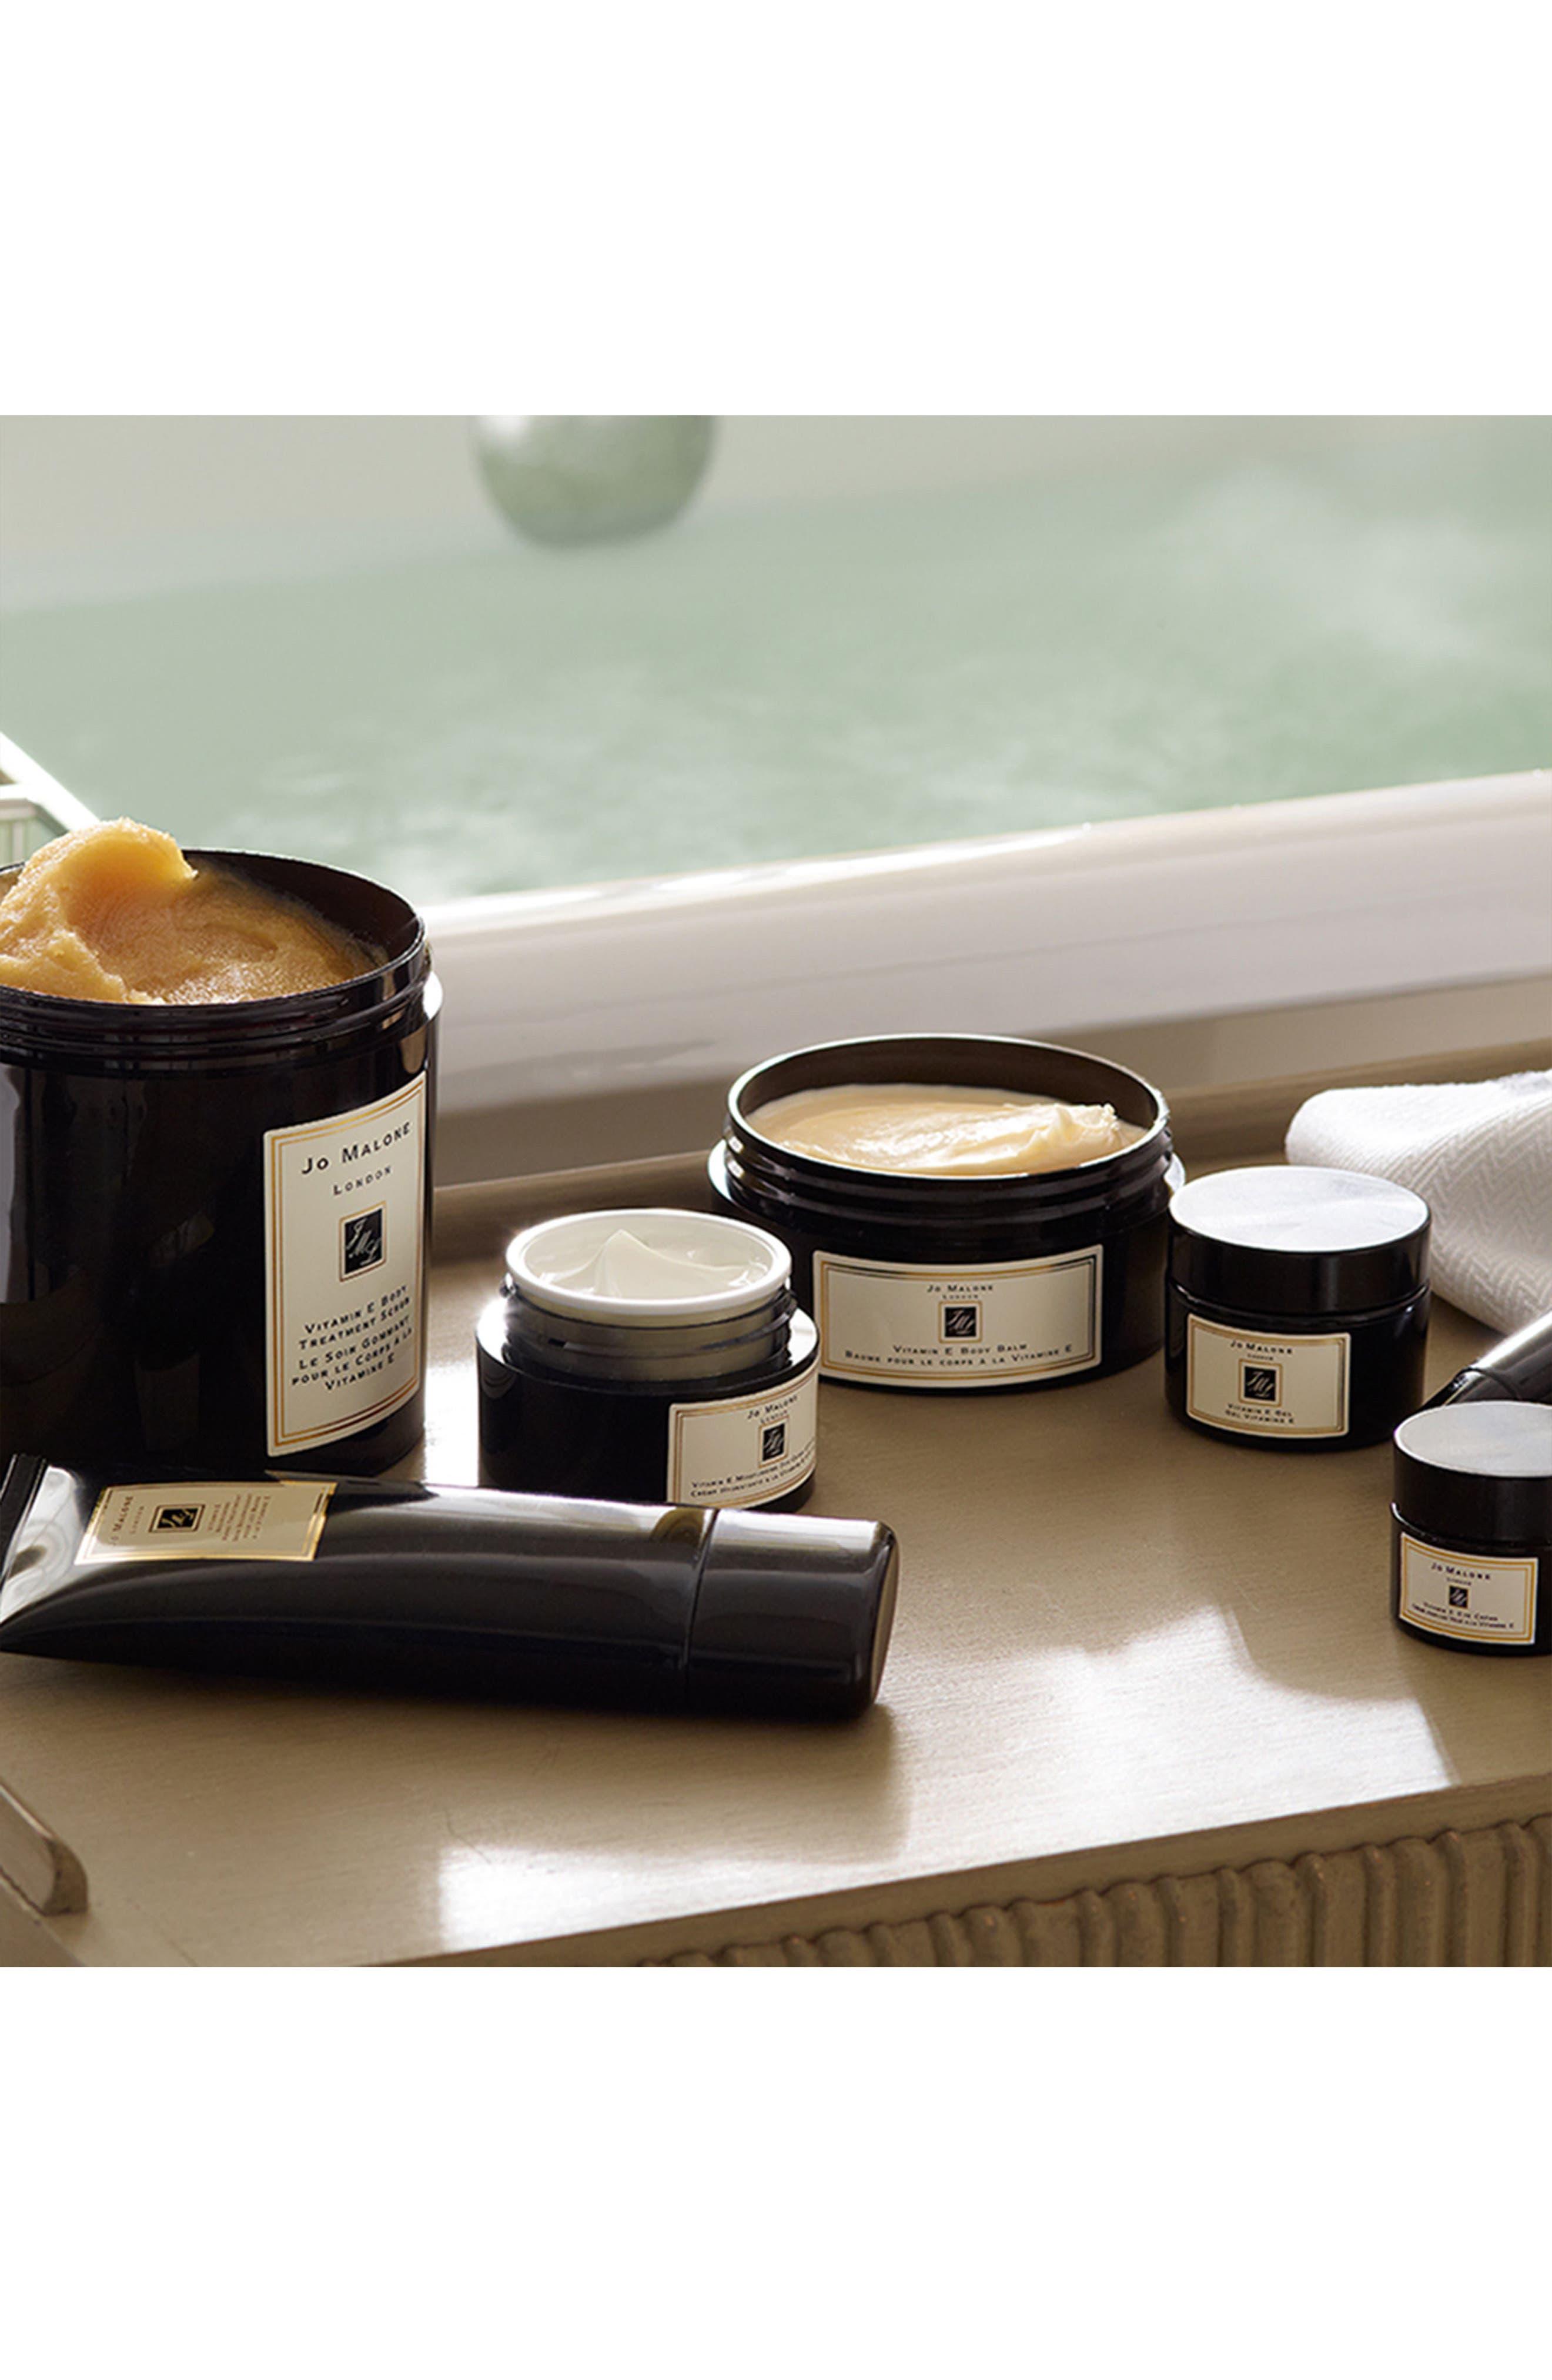 Alternate Image 2  - Jo Malone London™ 'Vitamin E' Moisturizing Day Crème Broad Spectrum SPF 15